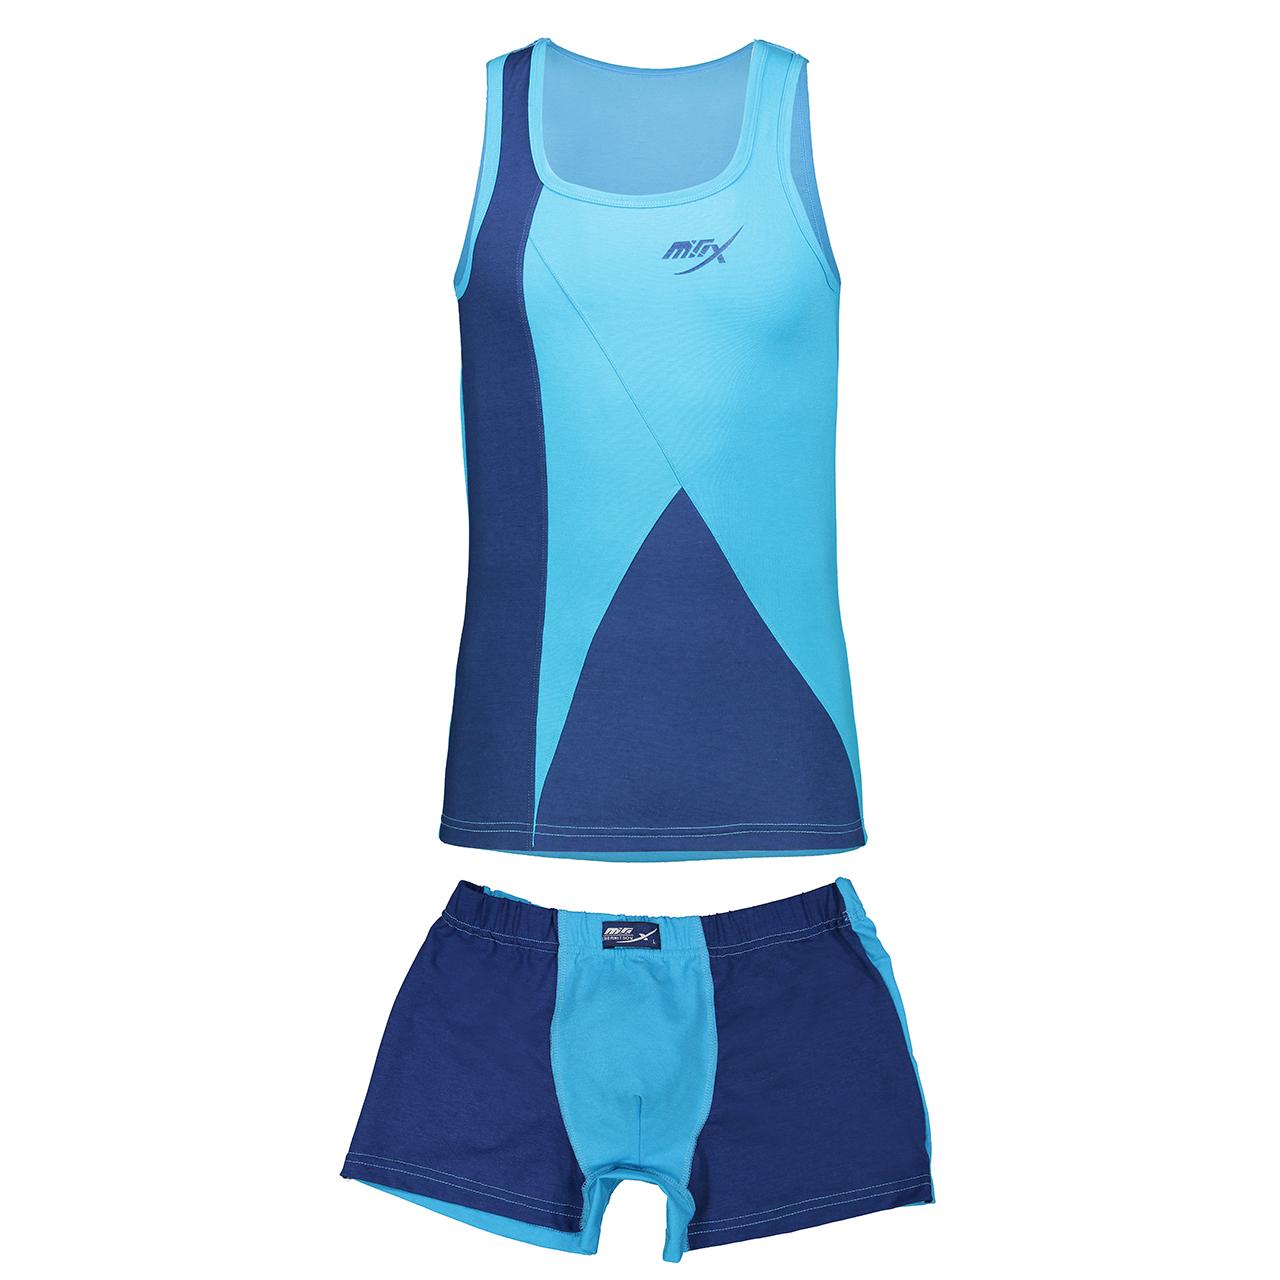 ست تاپ و شورت مردانه مکس کد 107   Max 107 Top And Underwear For Men